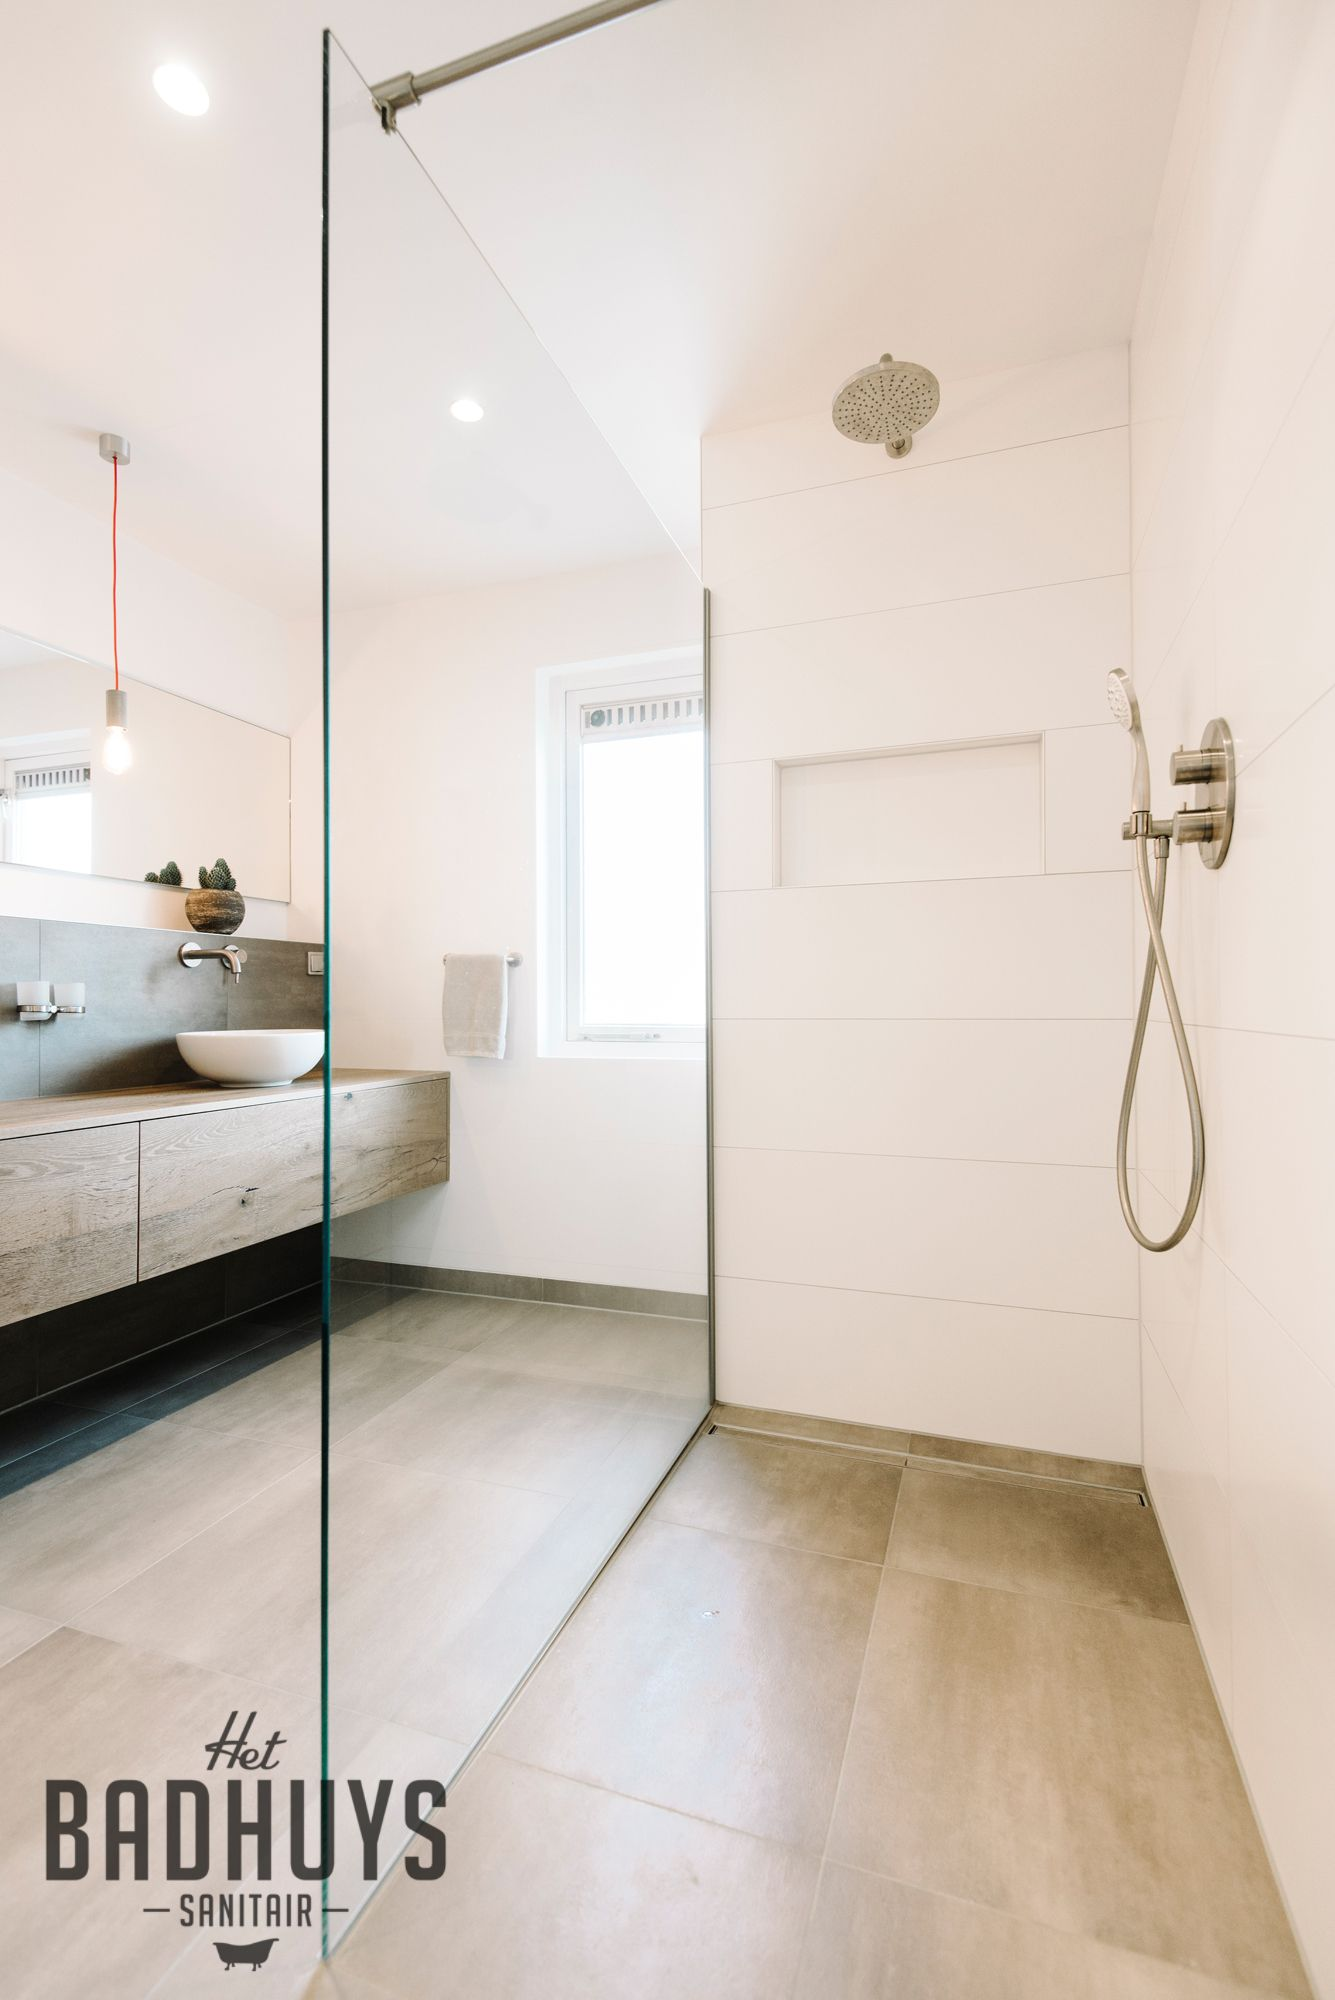 Het Badhuys Breda - Huisdecoratie | Pinterest - Badkamer, Badkamers ...